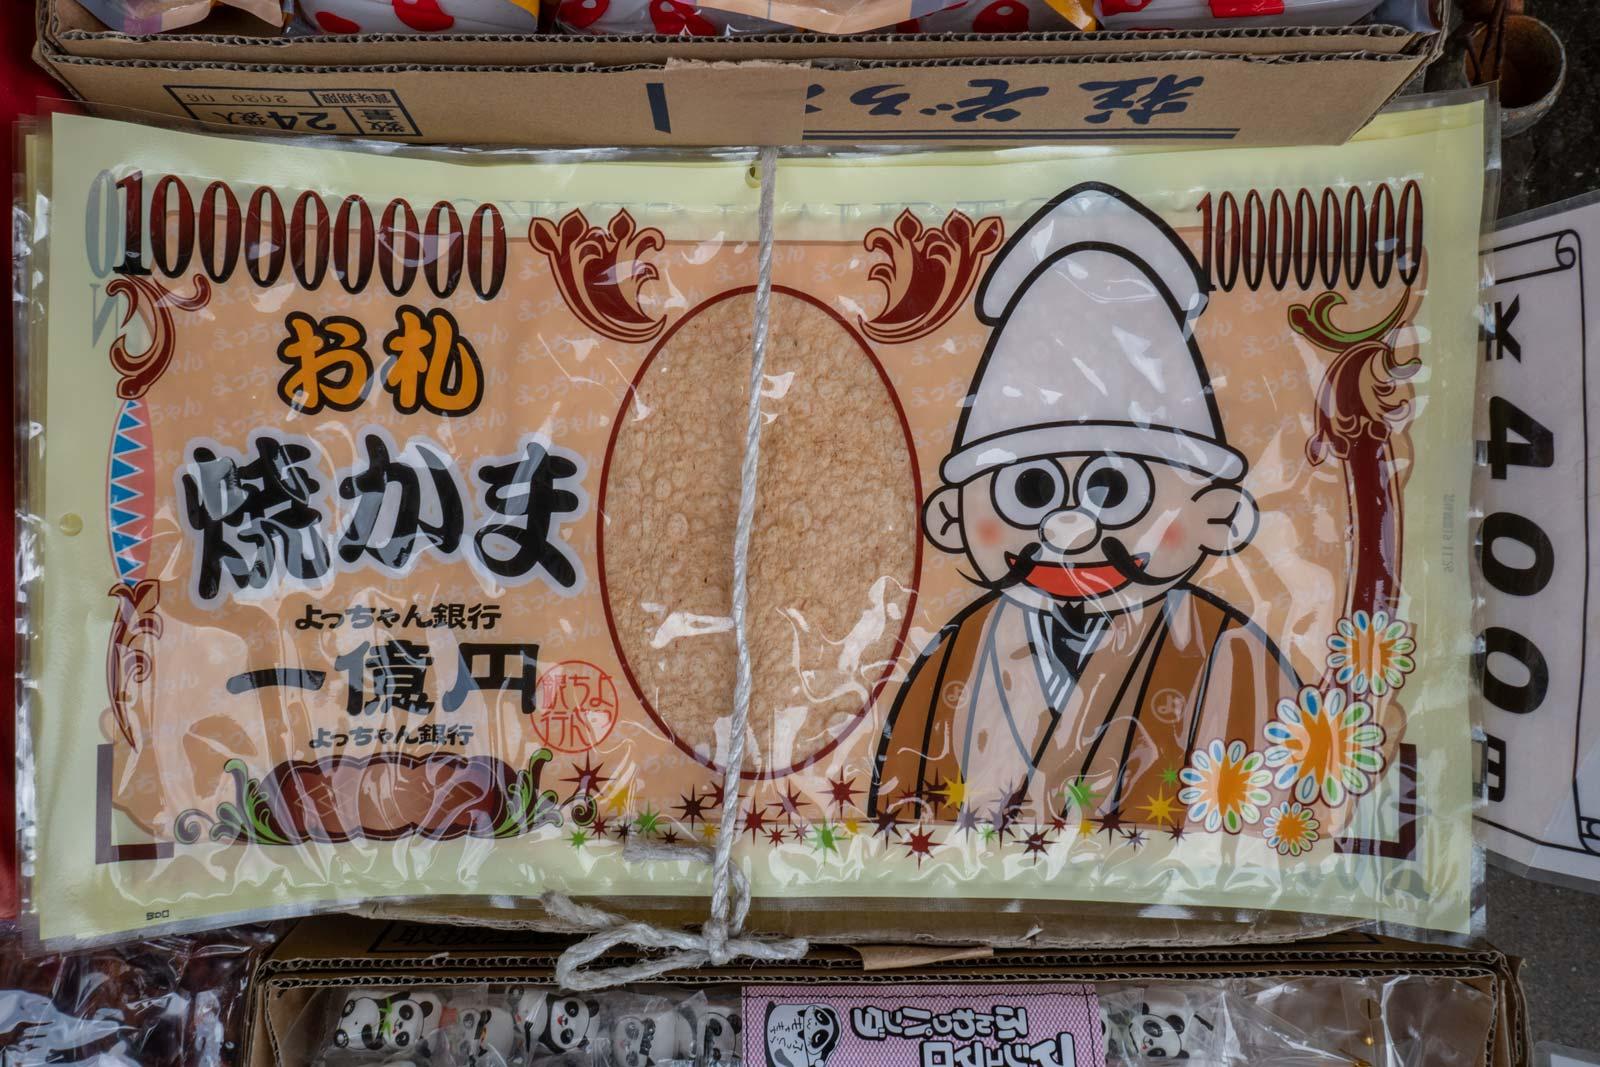 100 million yen squid candy at Matsumotoseka in Kawagoe